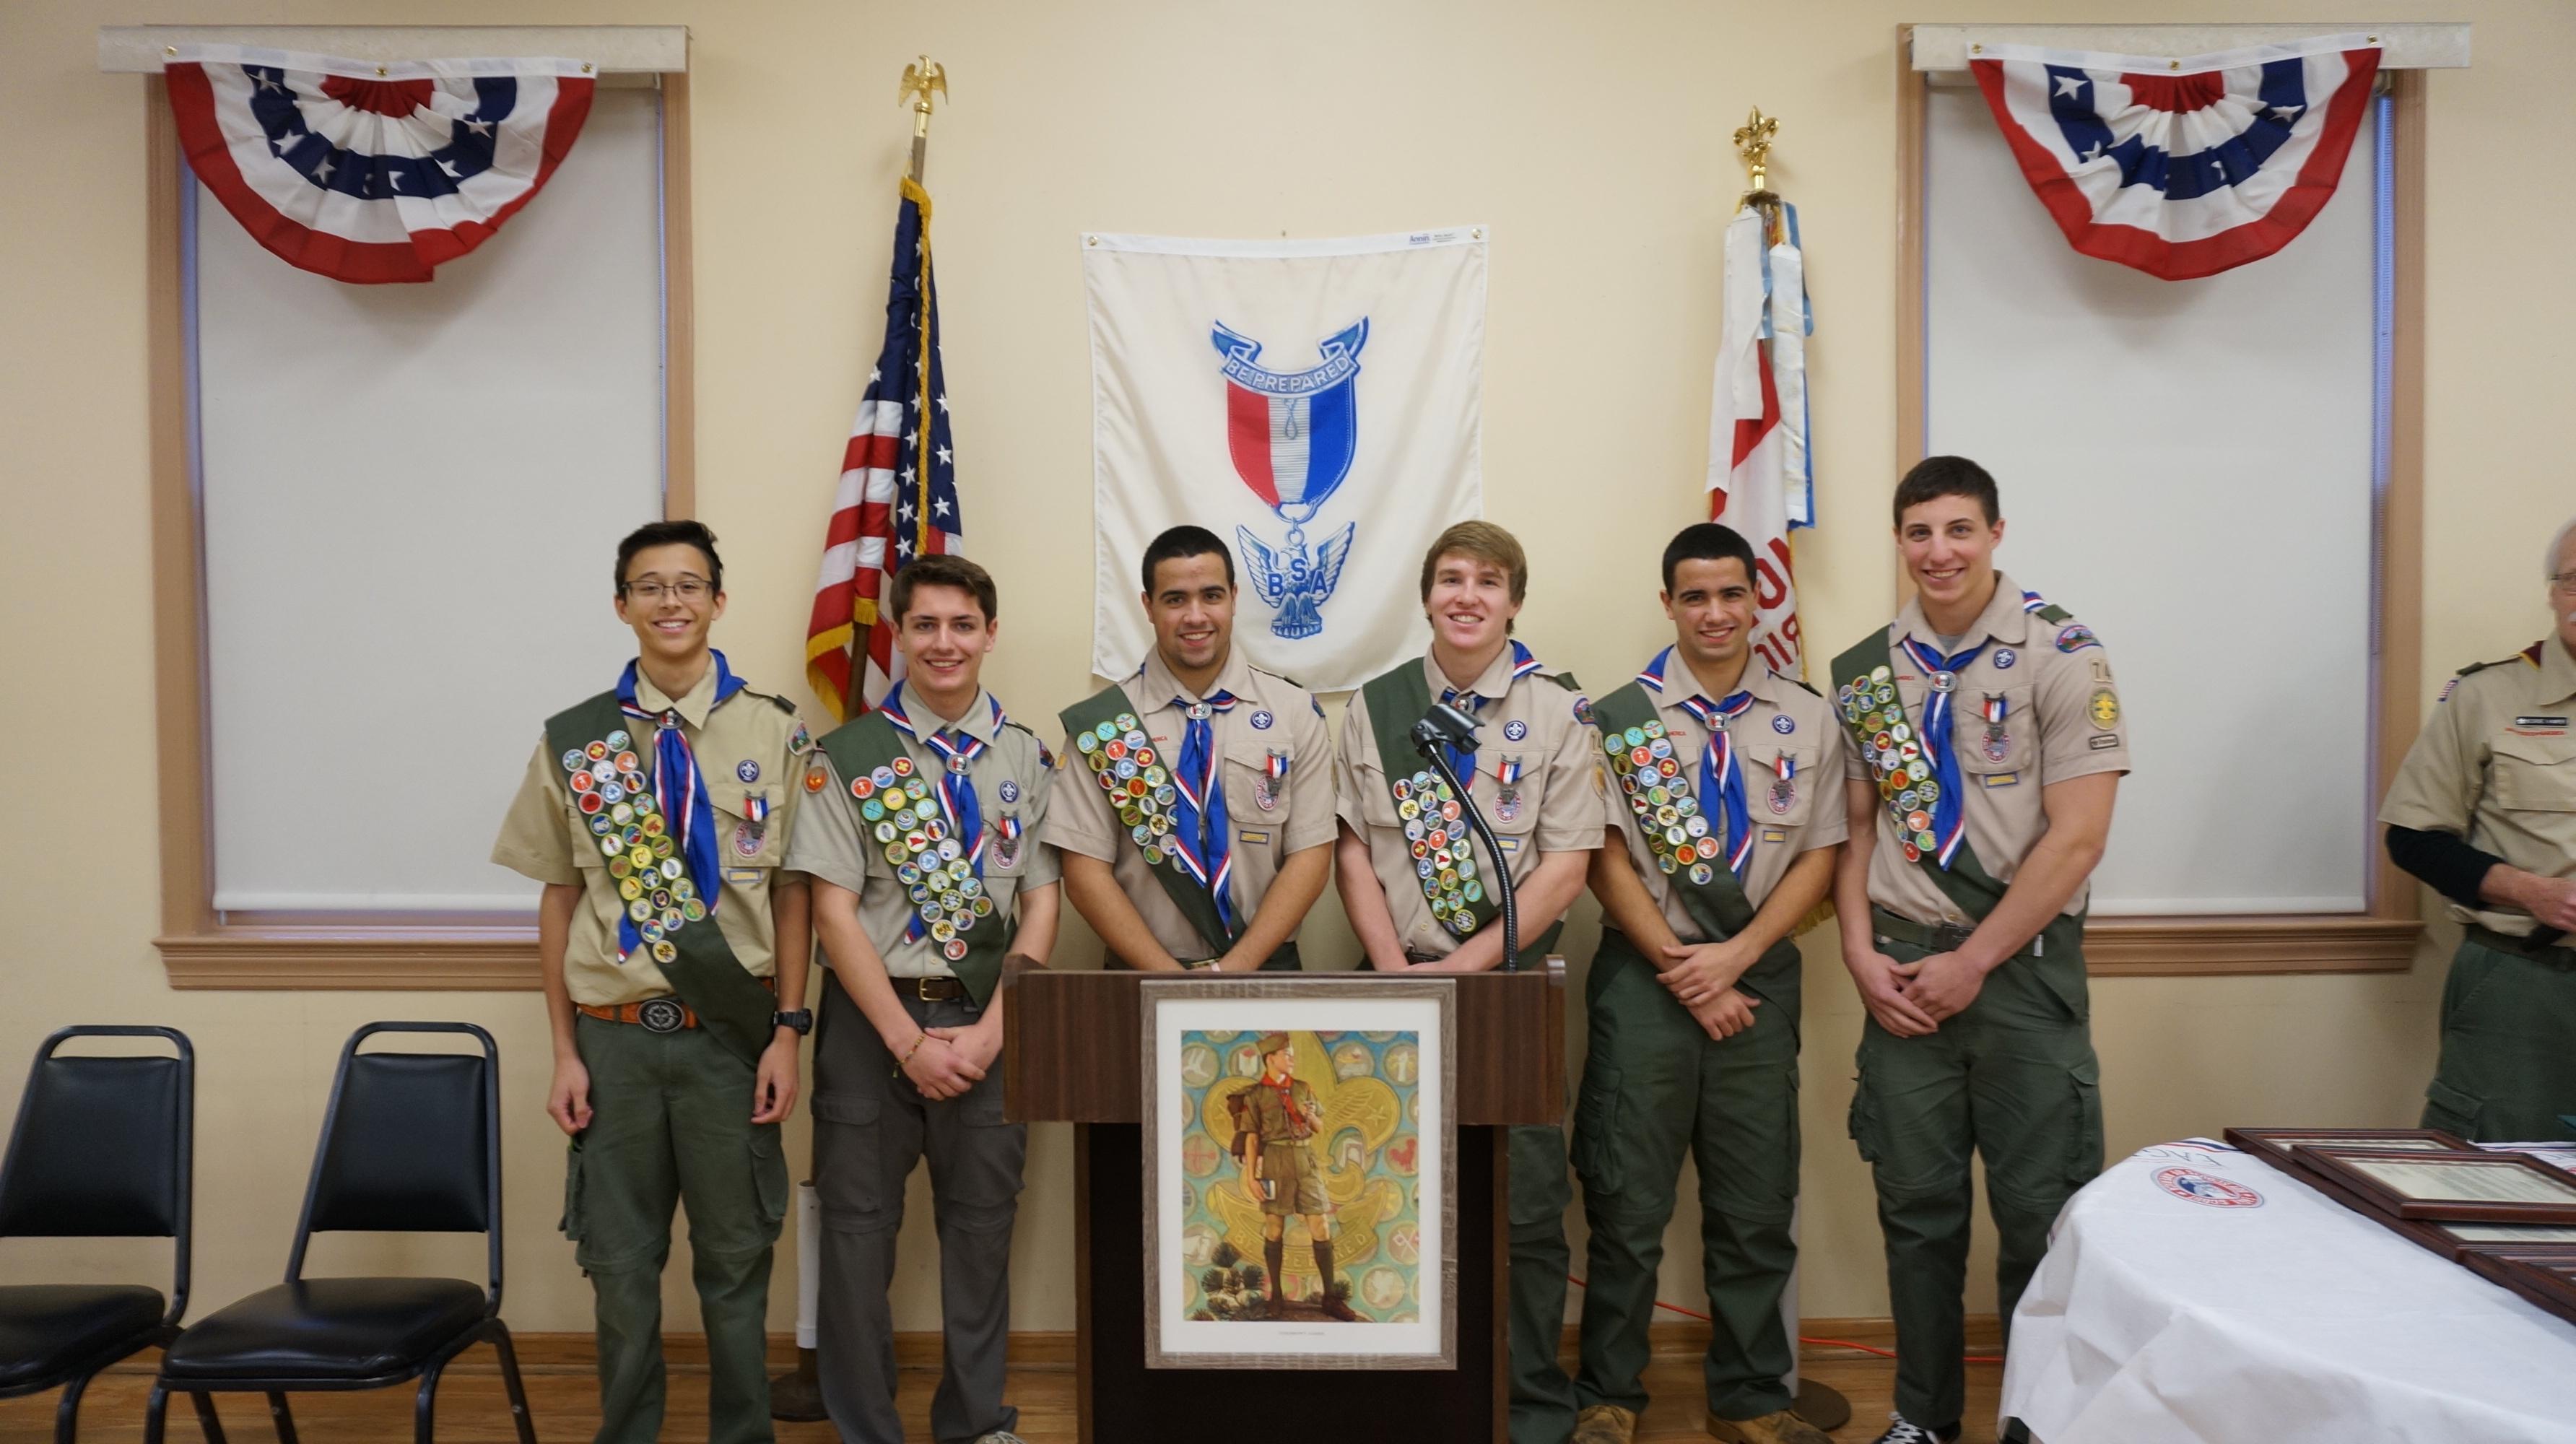 3cf628869a3aee3b9e8e_F_Six_Scouts_Eagle_Dec_2015_060.JPG